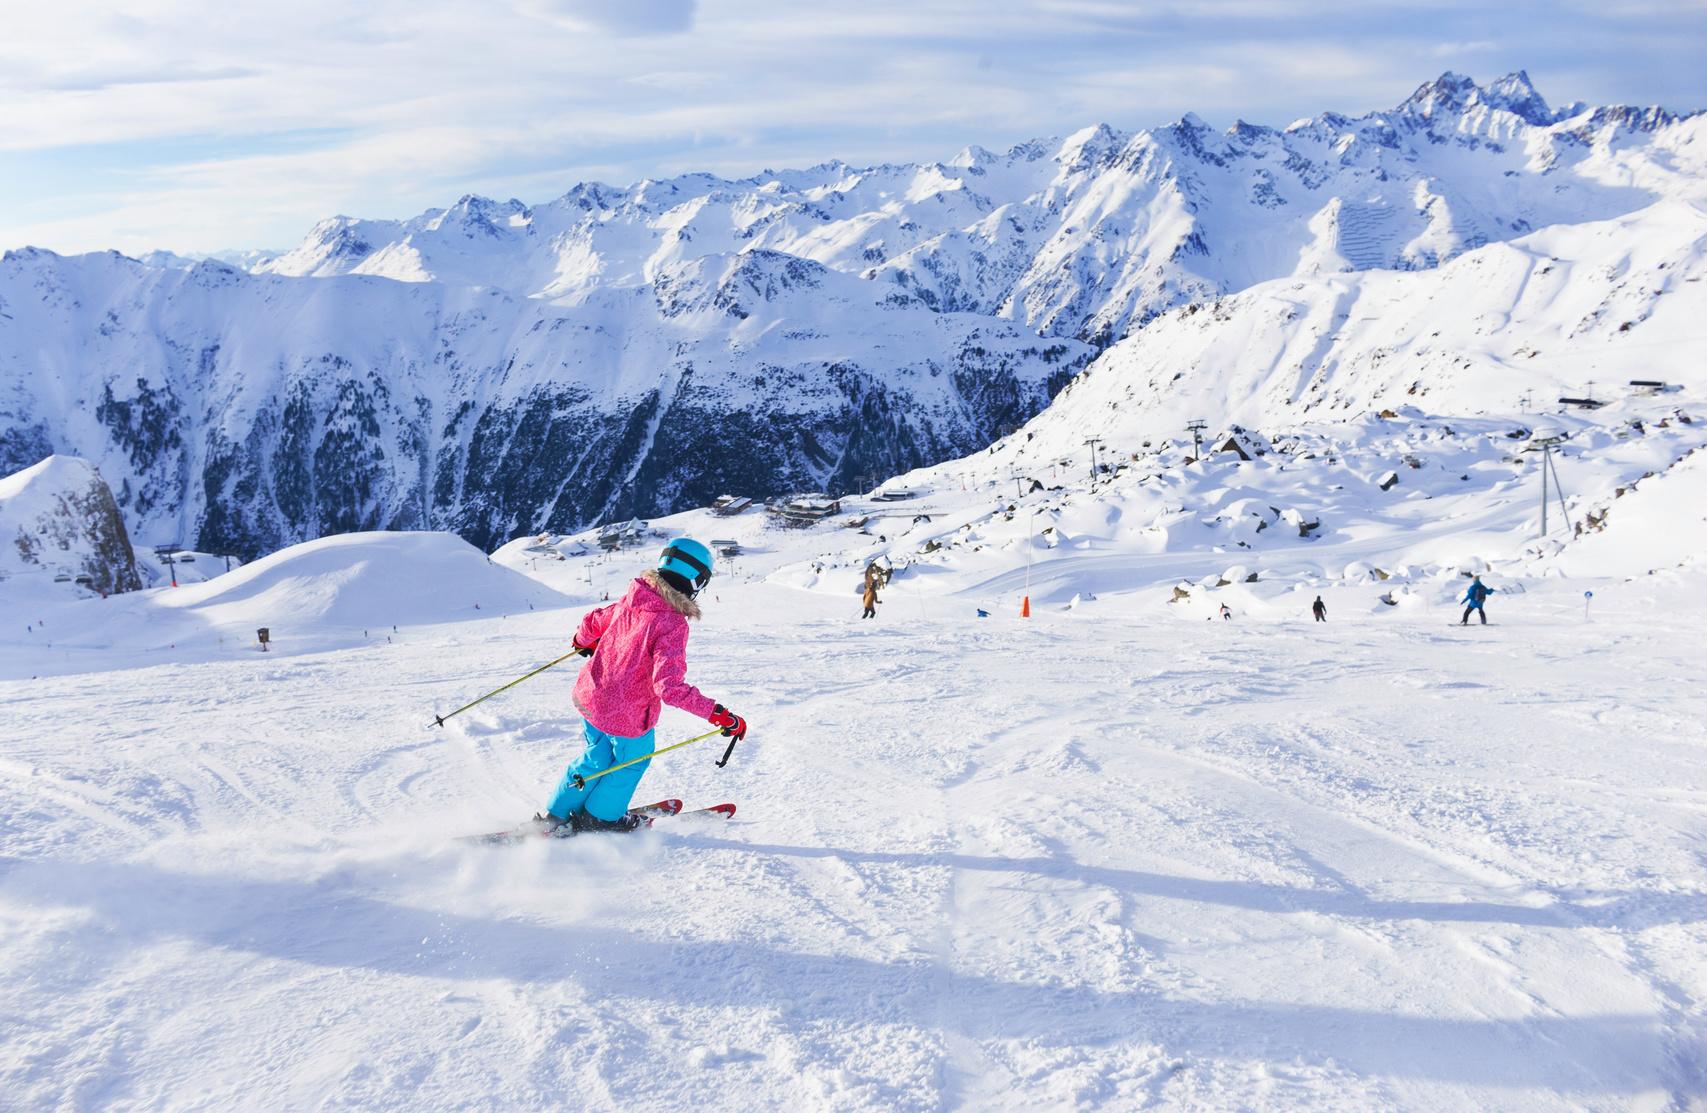 ski resort near osaka day trip to hachi kita kogen voyagin. Black Bedroom Furniture Sets. Home Design Ideas